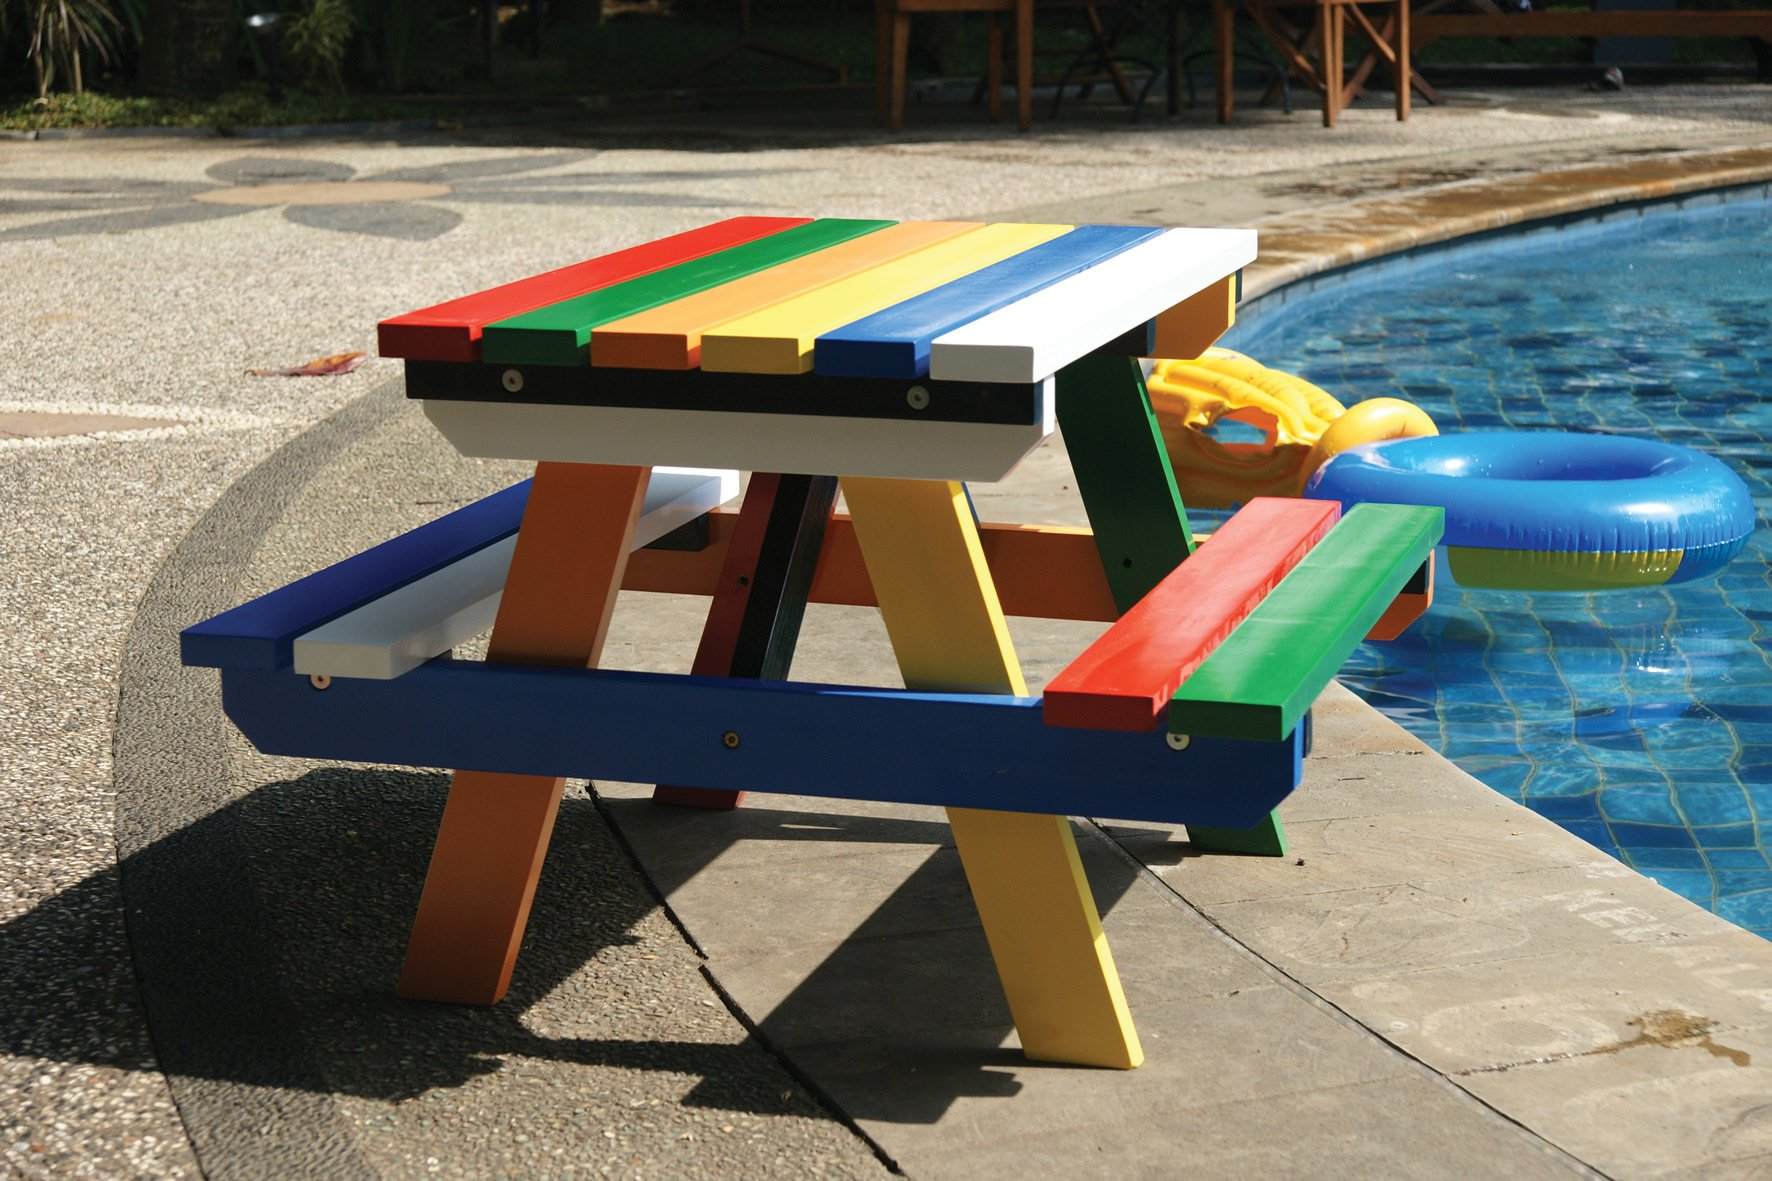 Hardwood Painted Junior Picnic Table